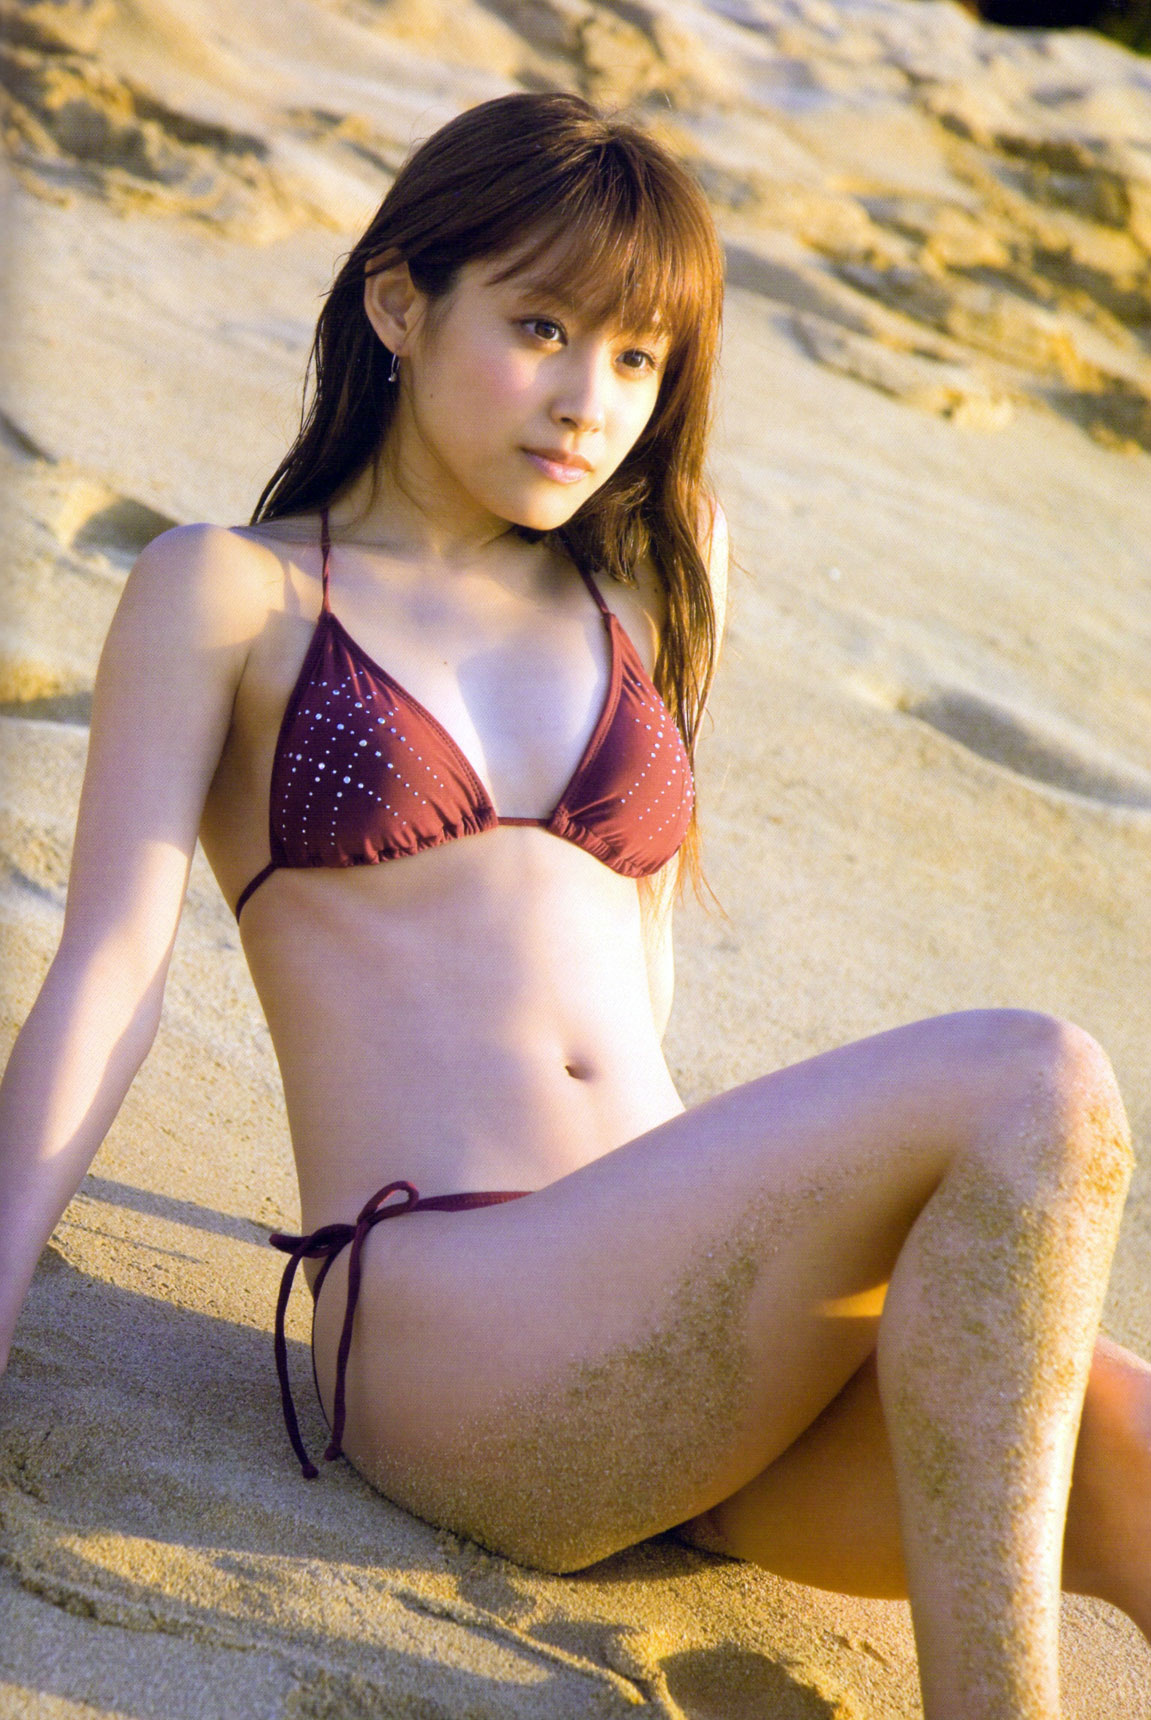 http://blog.cnobi.jp/v1/blog/user/a8c5c06266ed65ea9b67299e90592fa7/1340924780